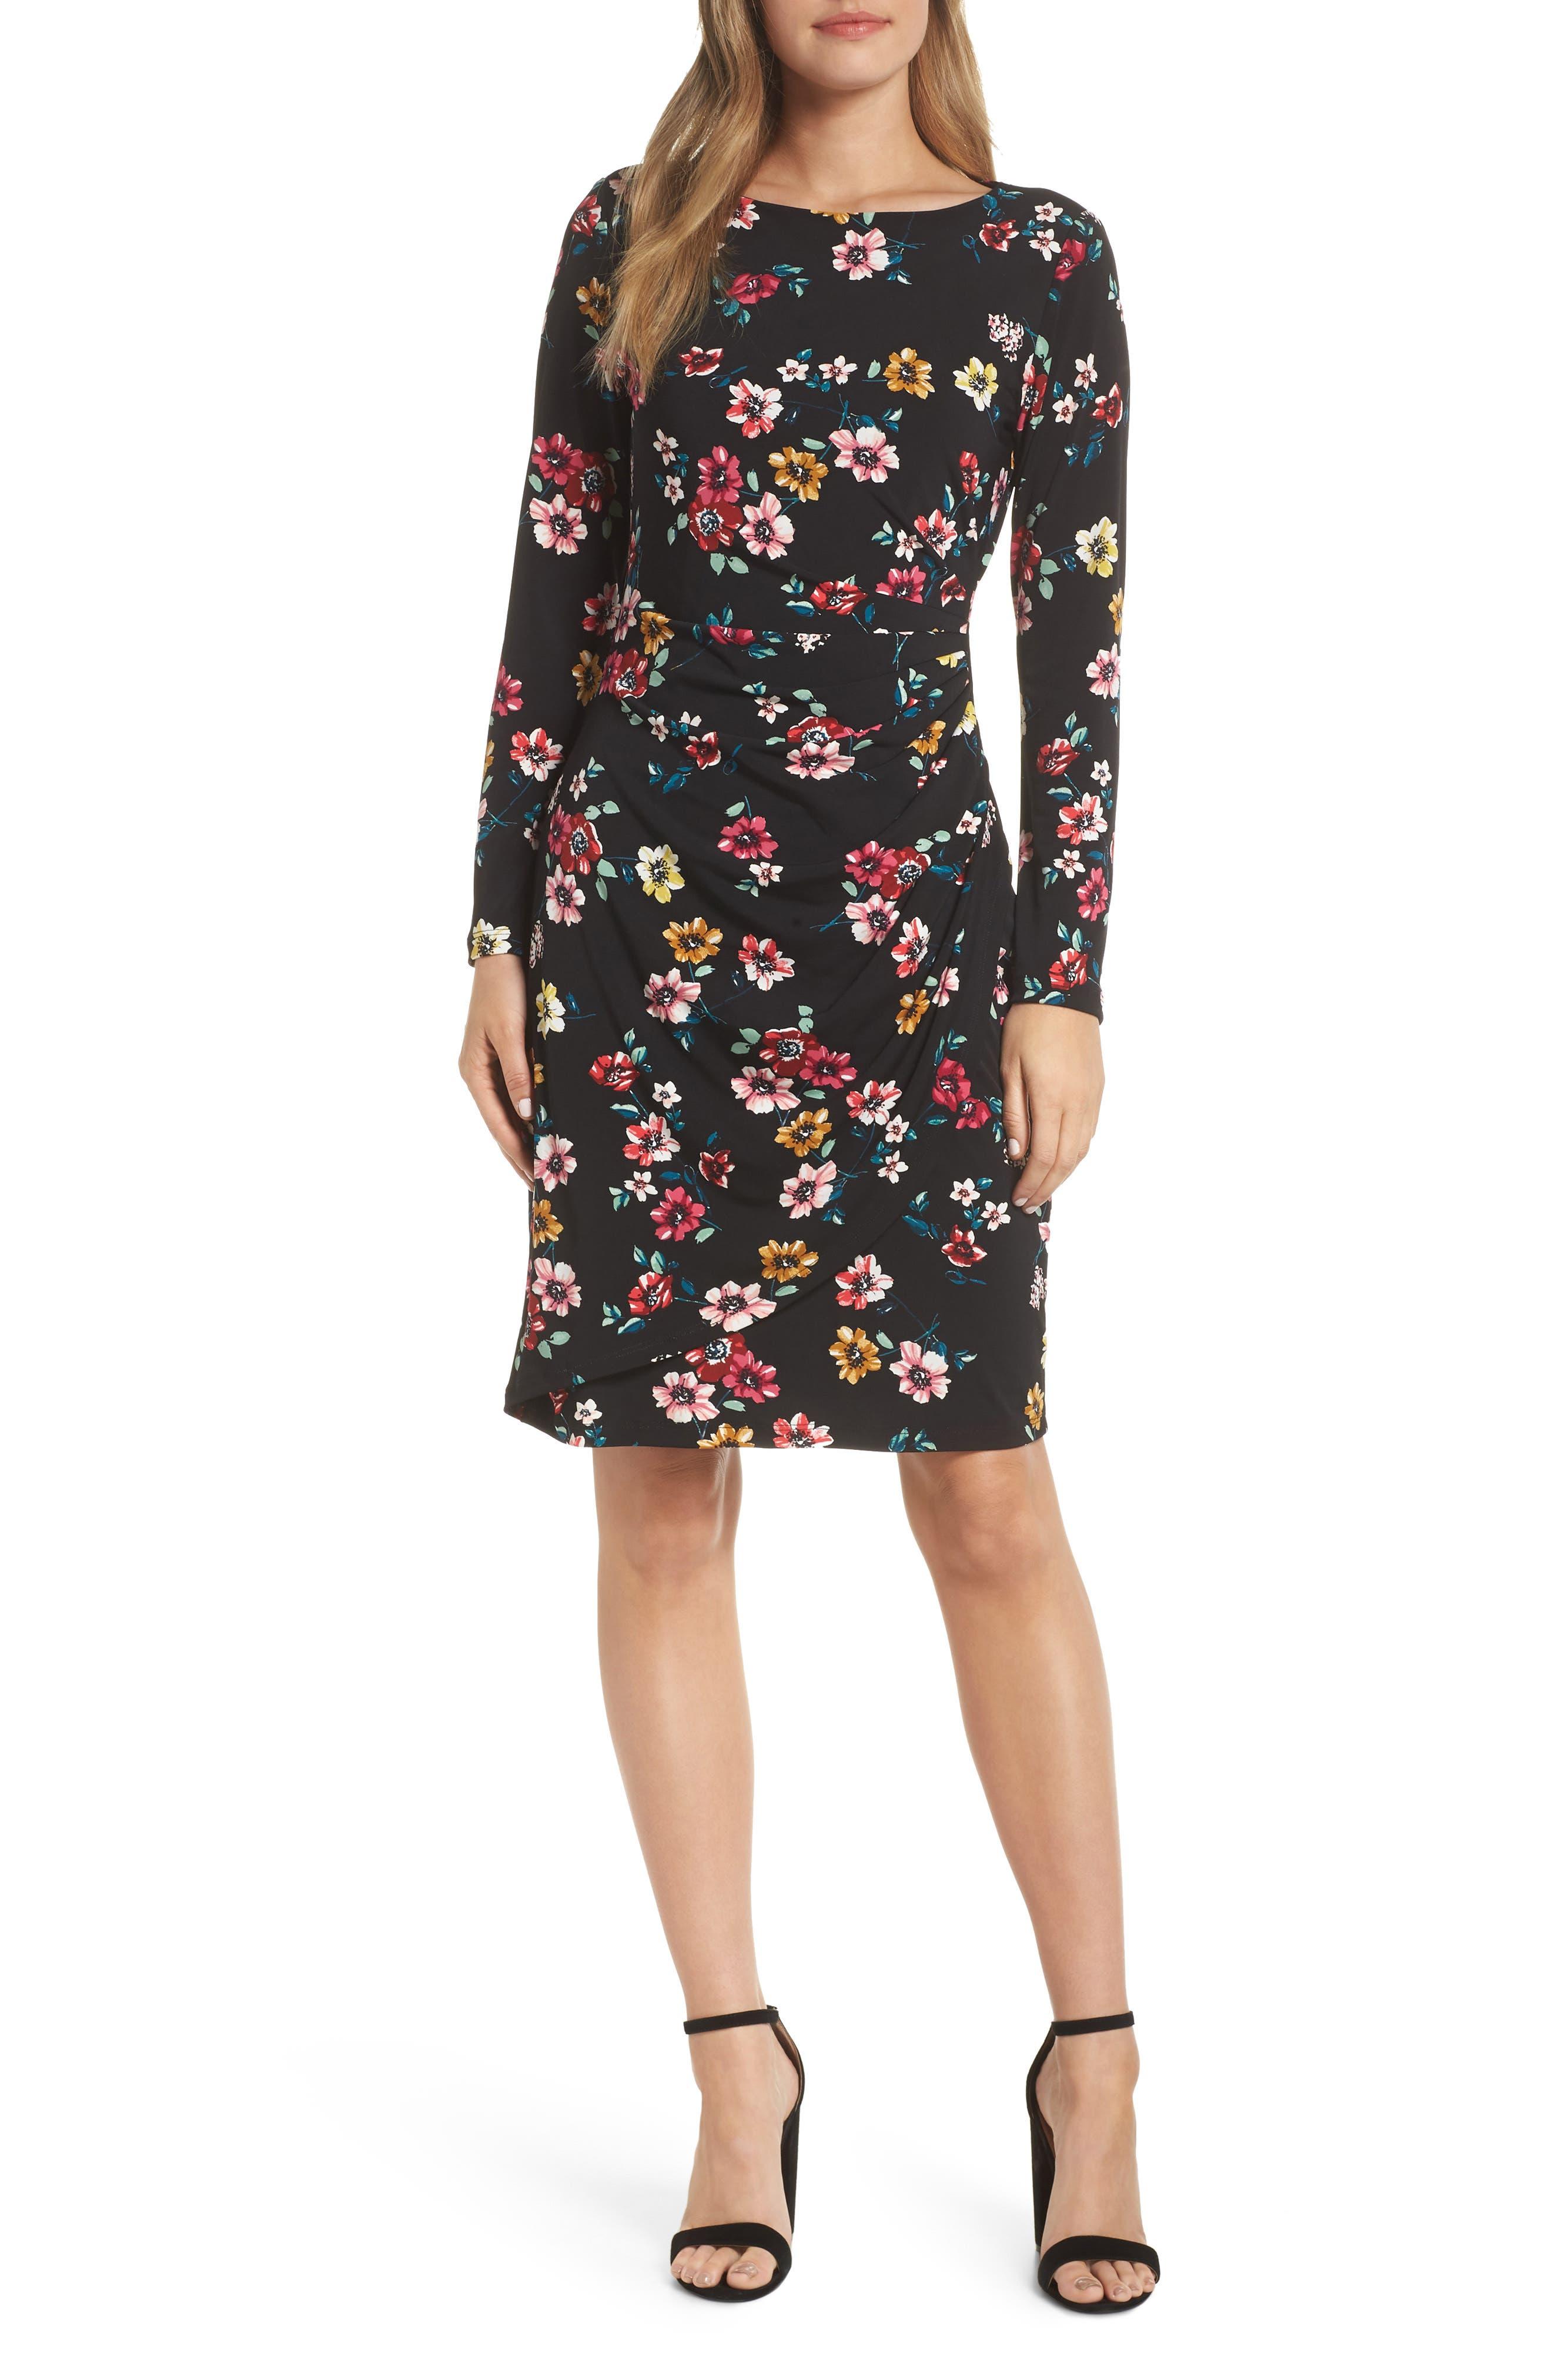 Eliza J Floral Sheath Dress, Black